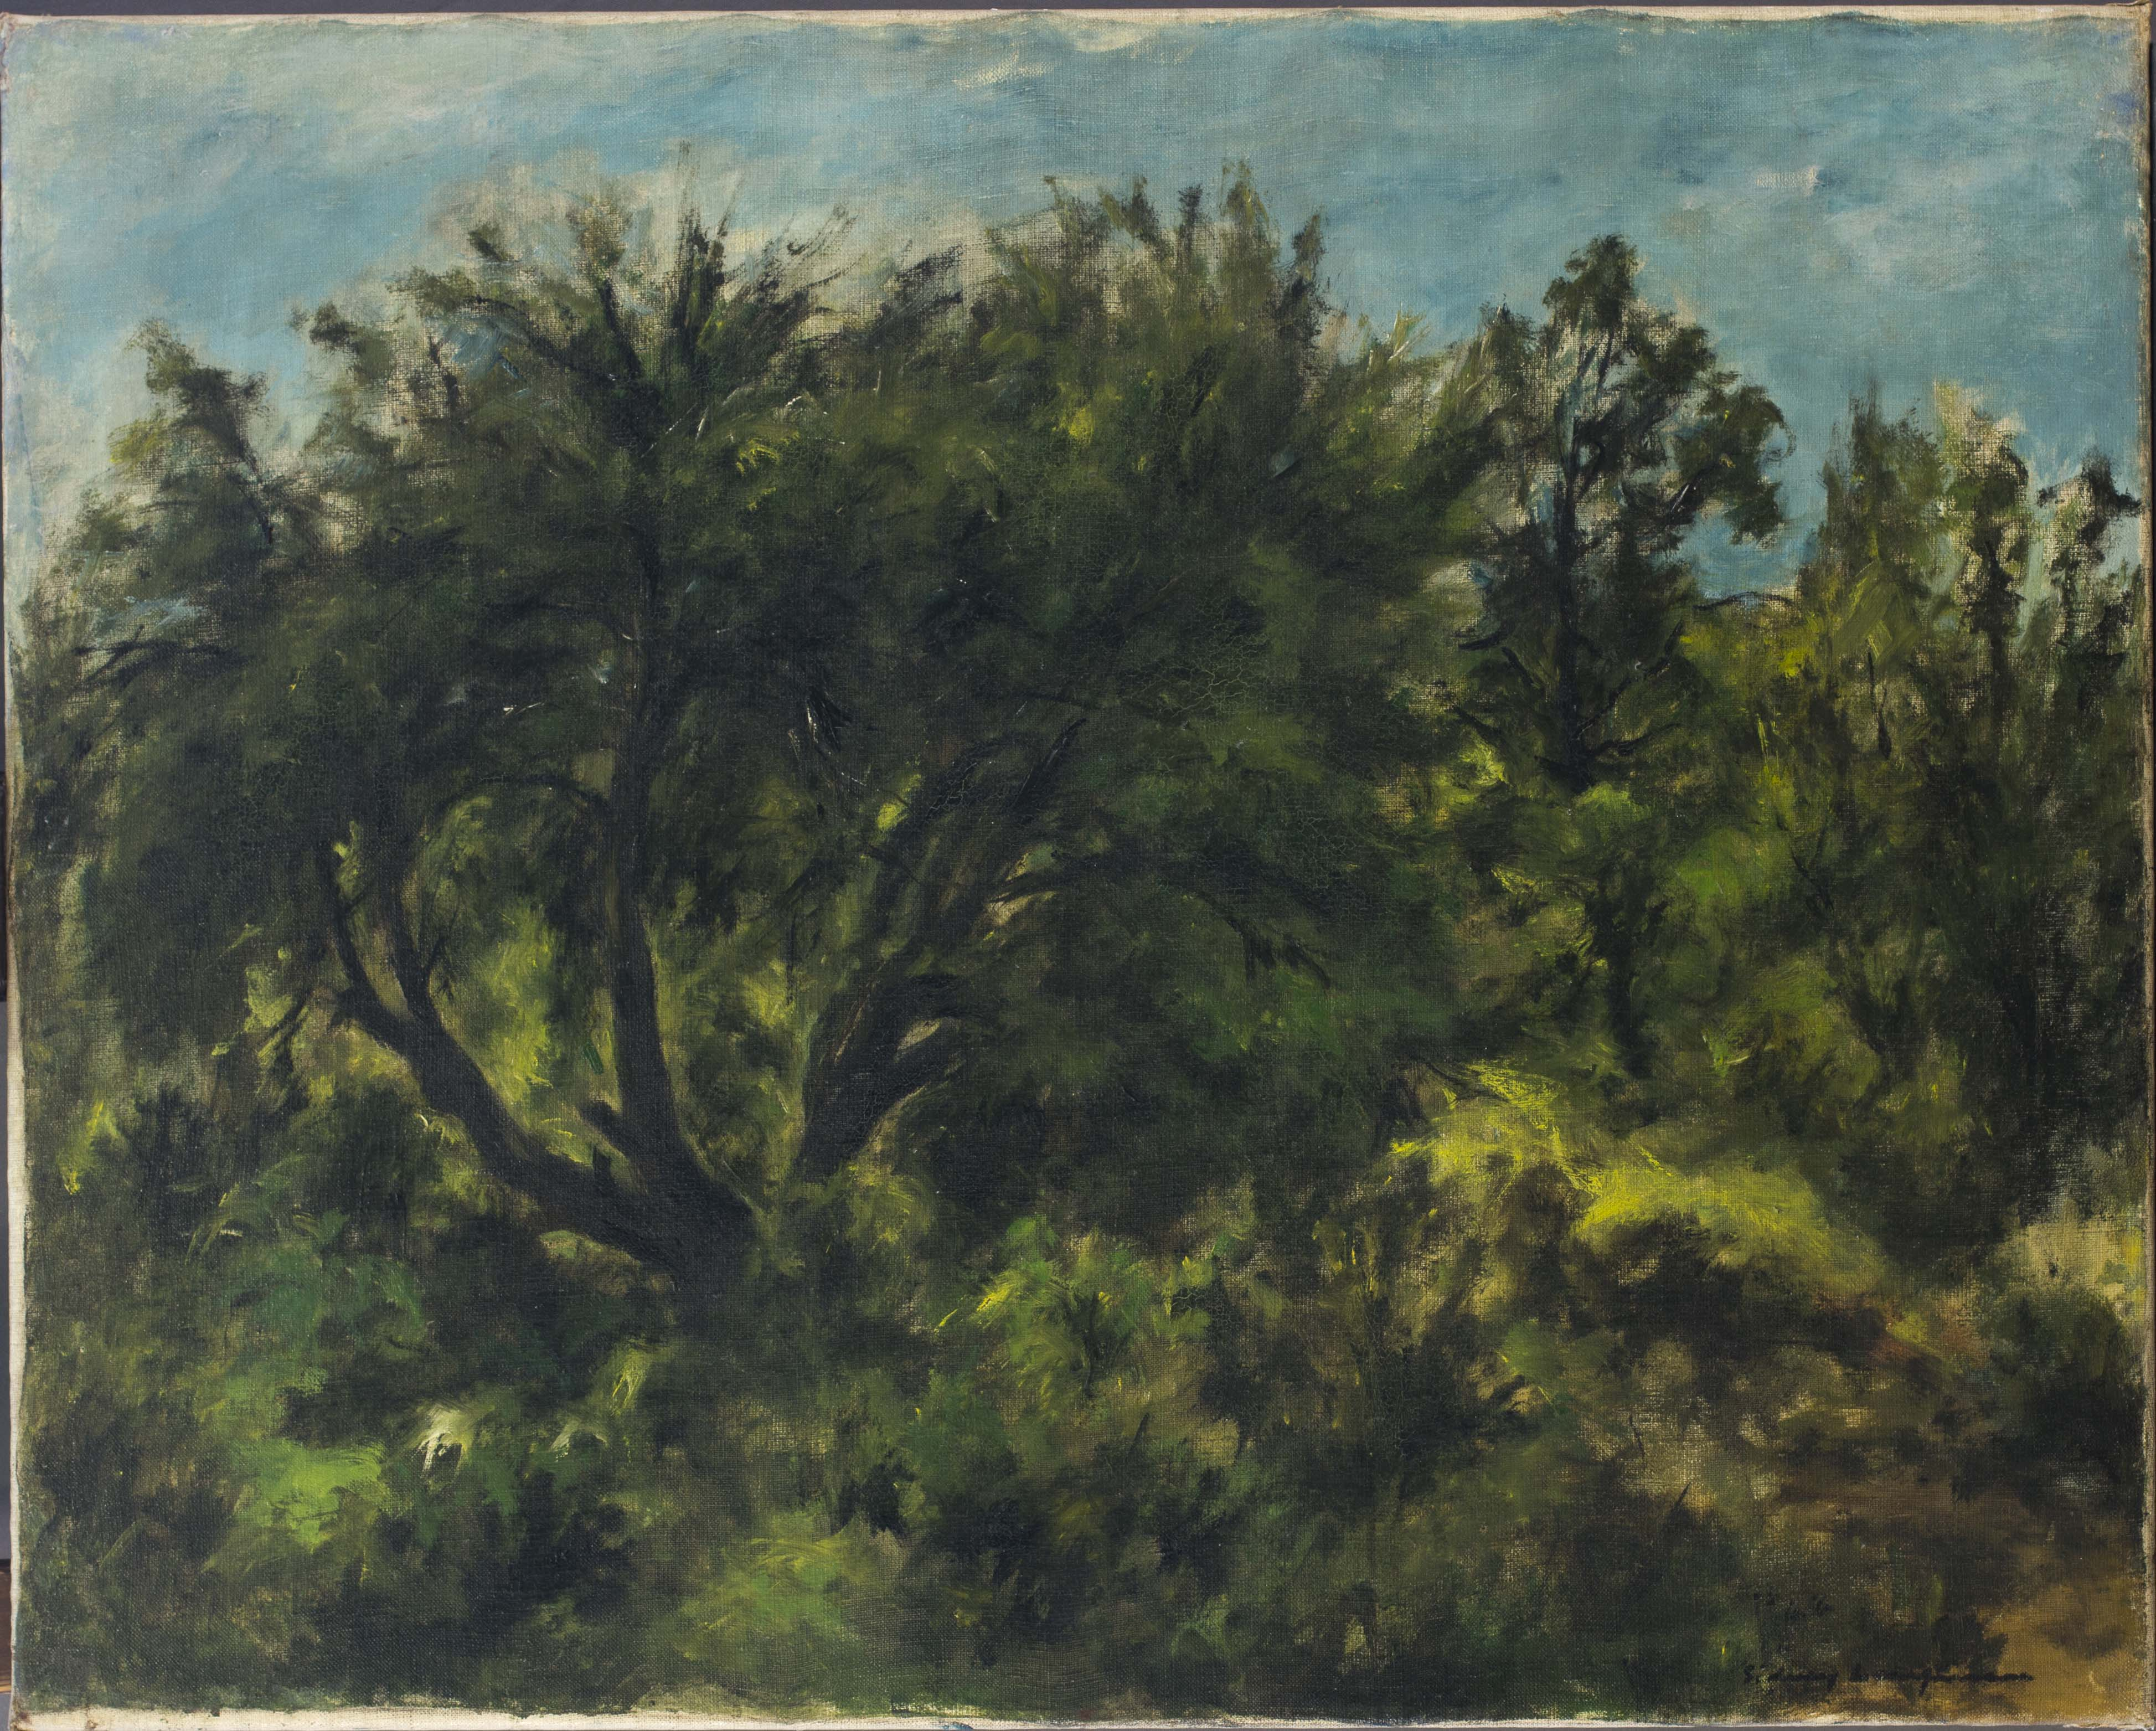 Sidney Laufman, The Apple Tree